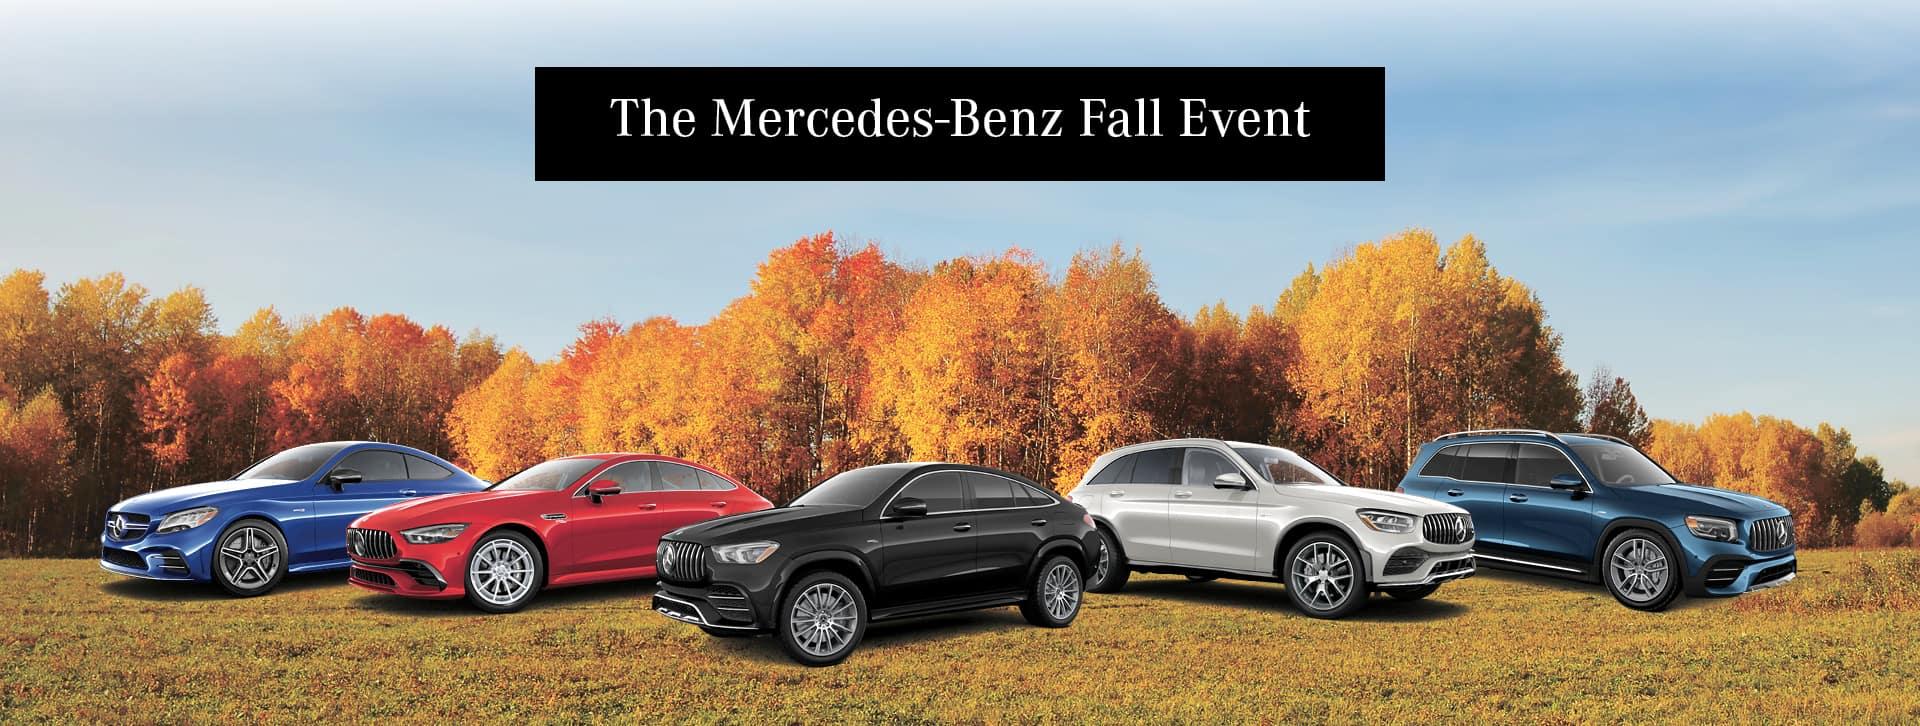 The Merceds Benz Fall Event